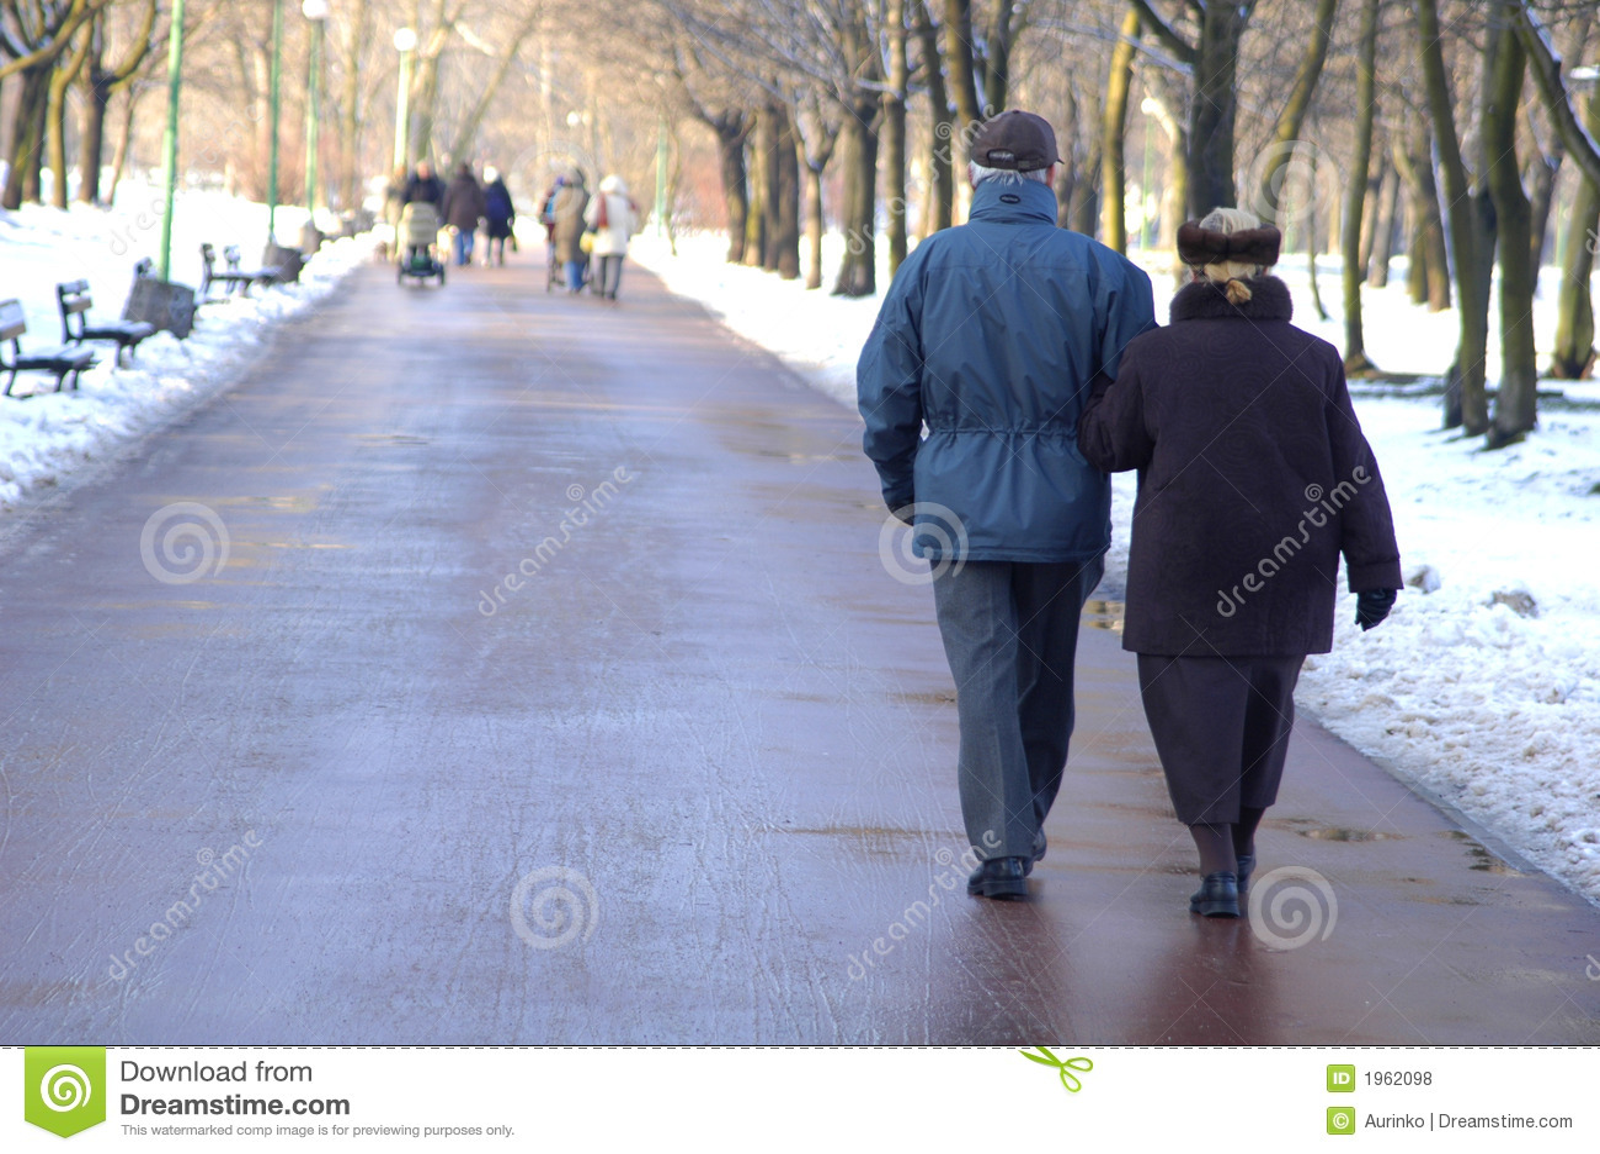 A couple of seniors walking